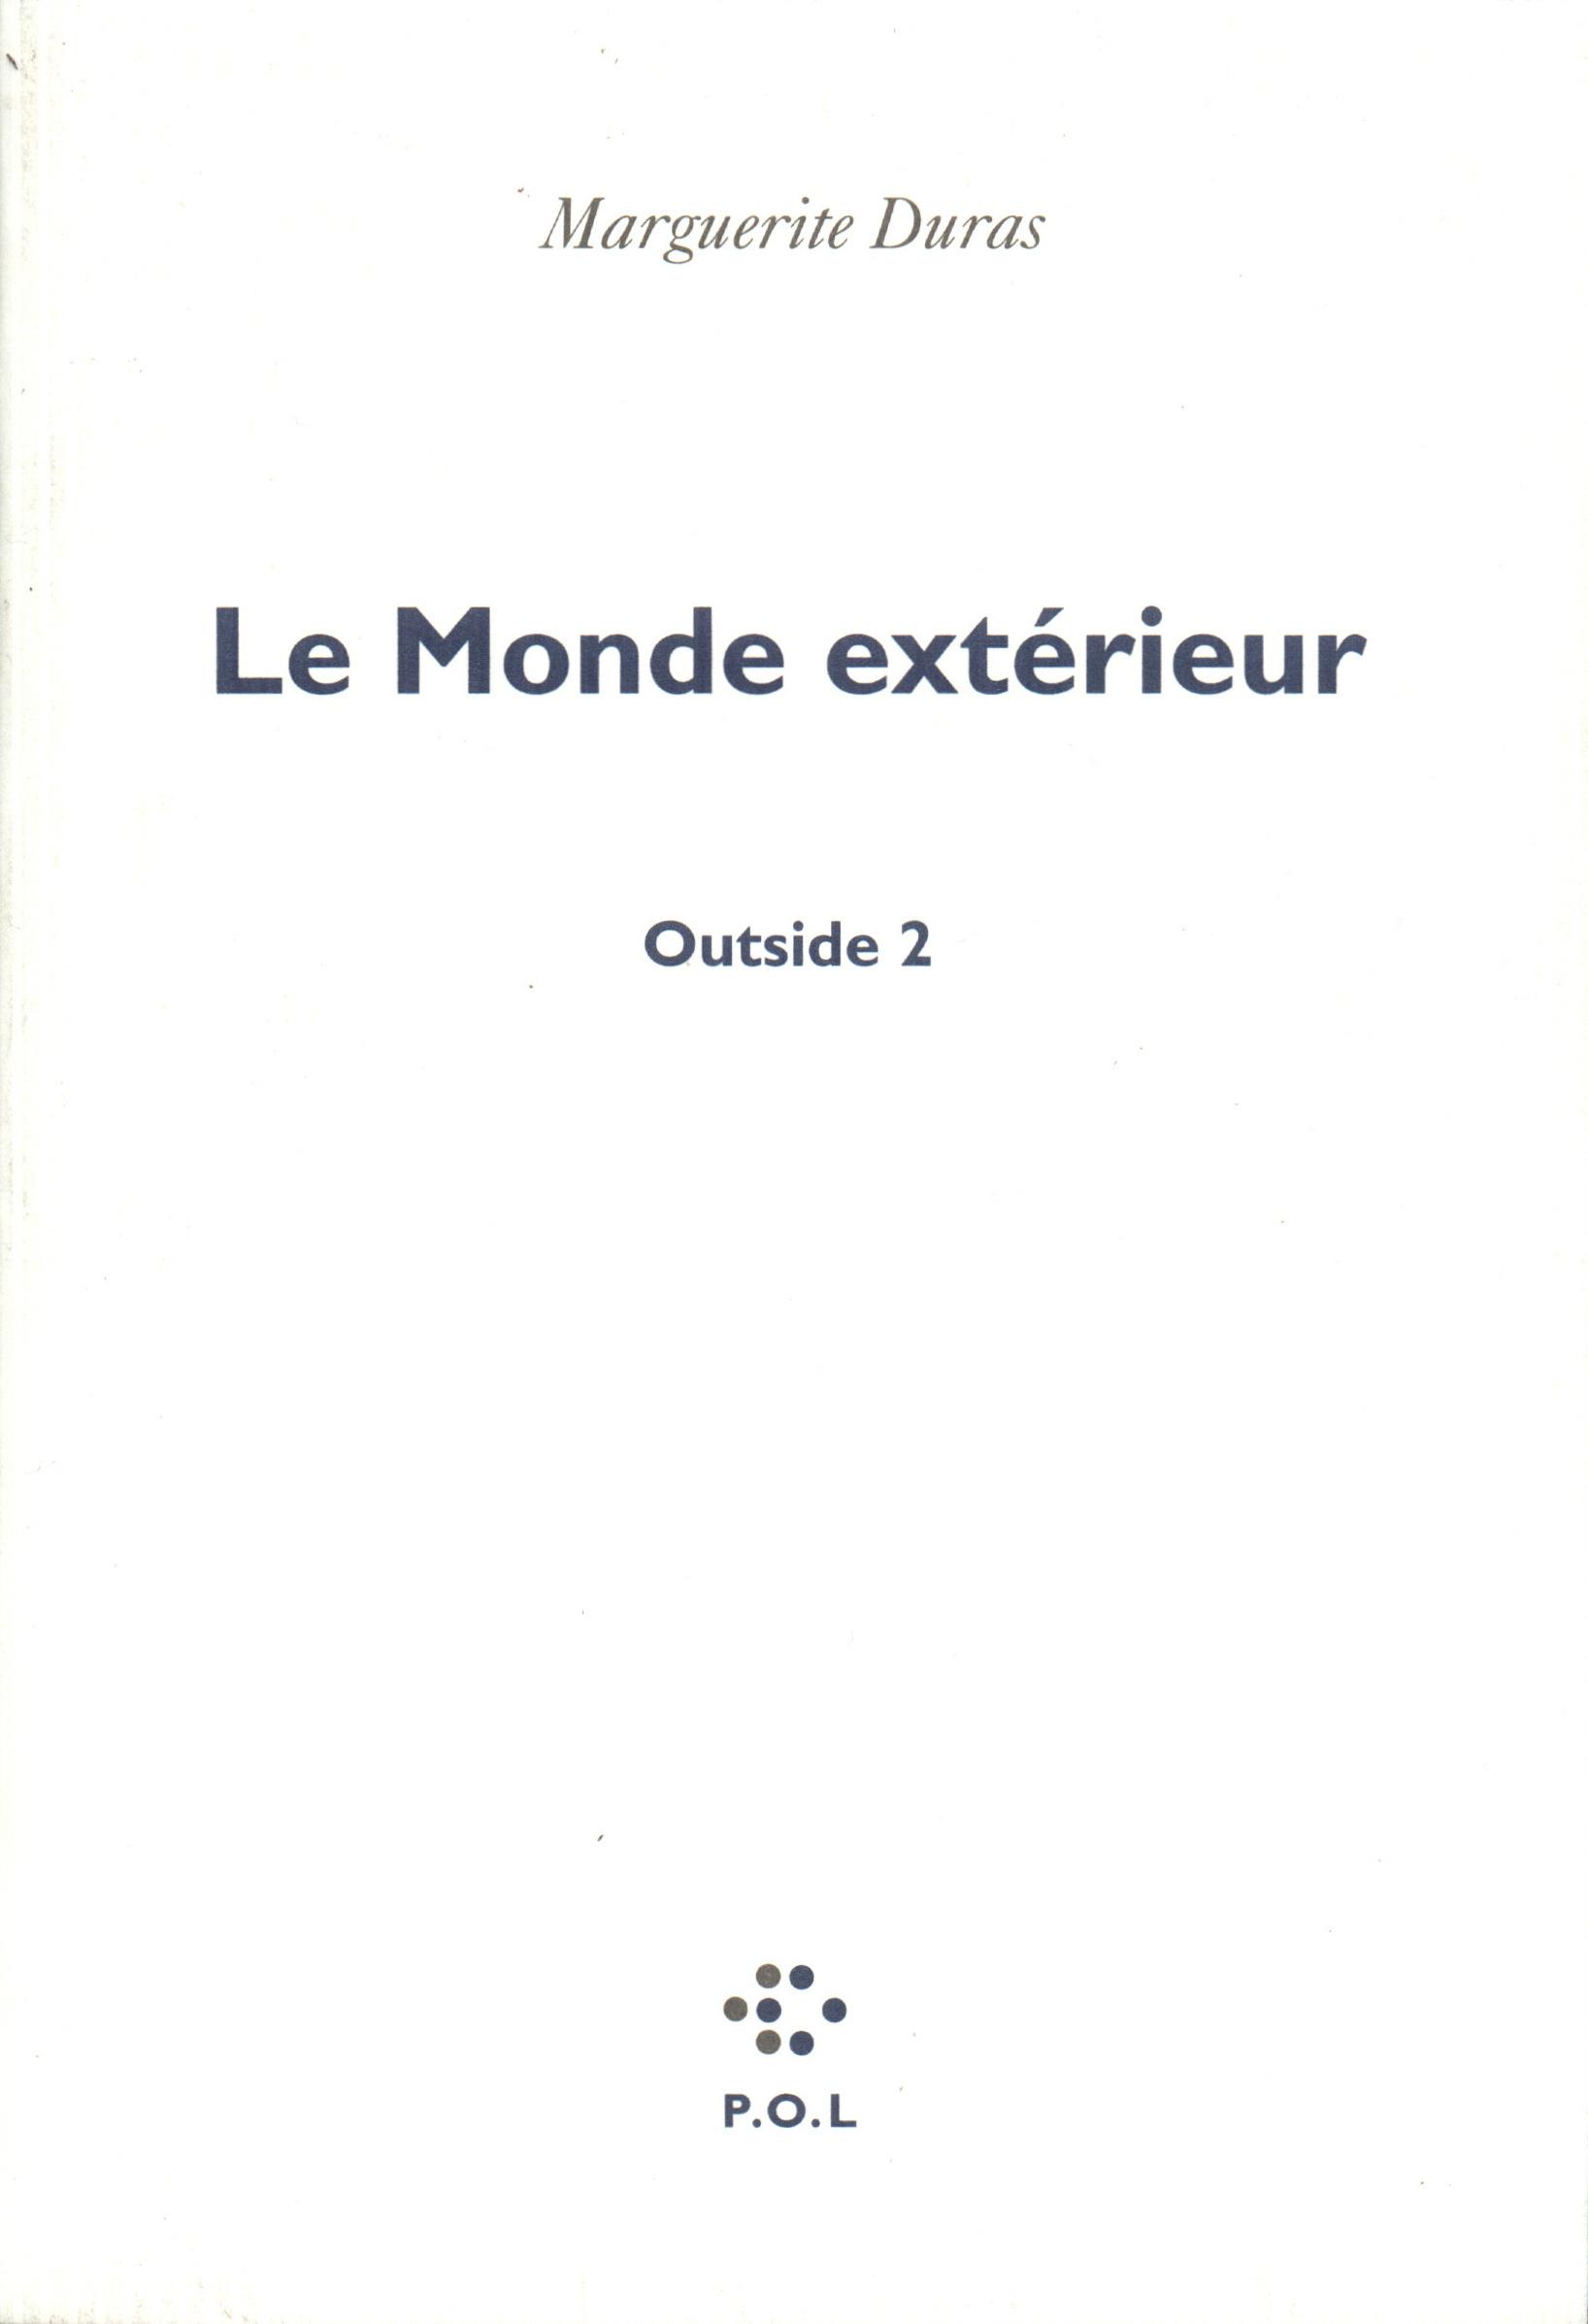 OUTSIDE, II : LE MONDE EXTERIEUR